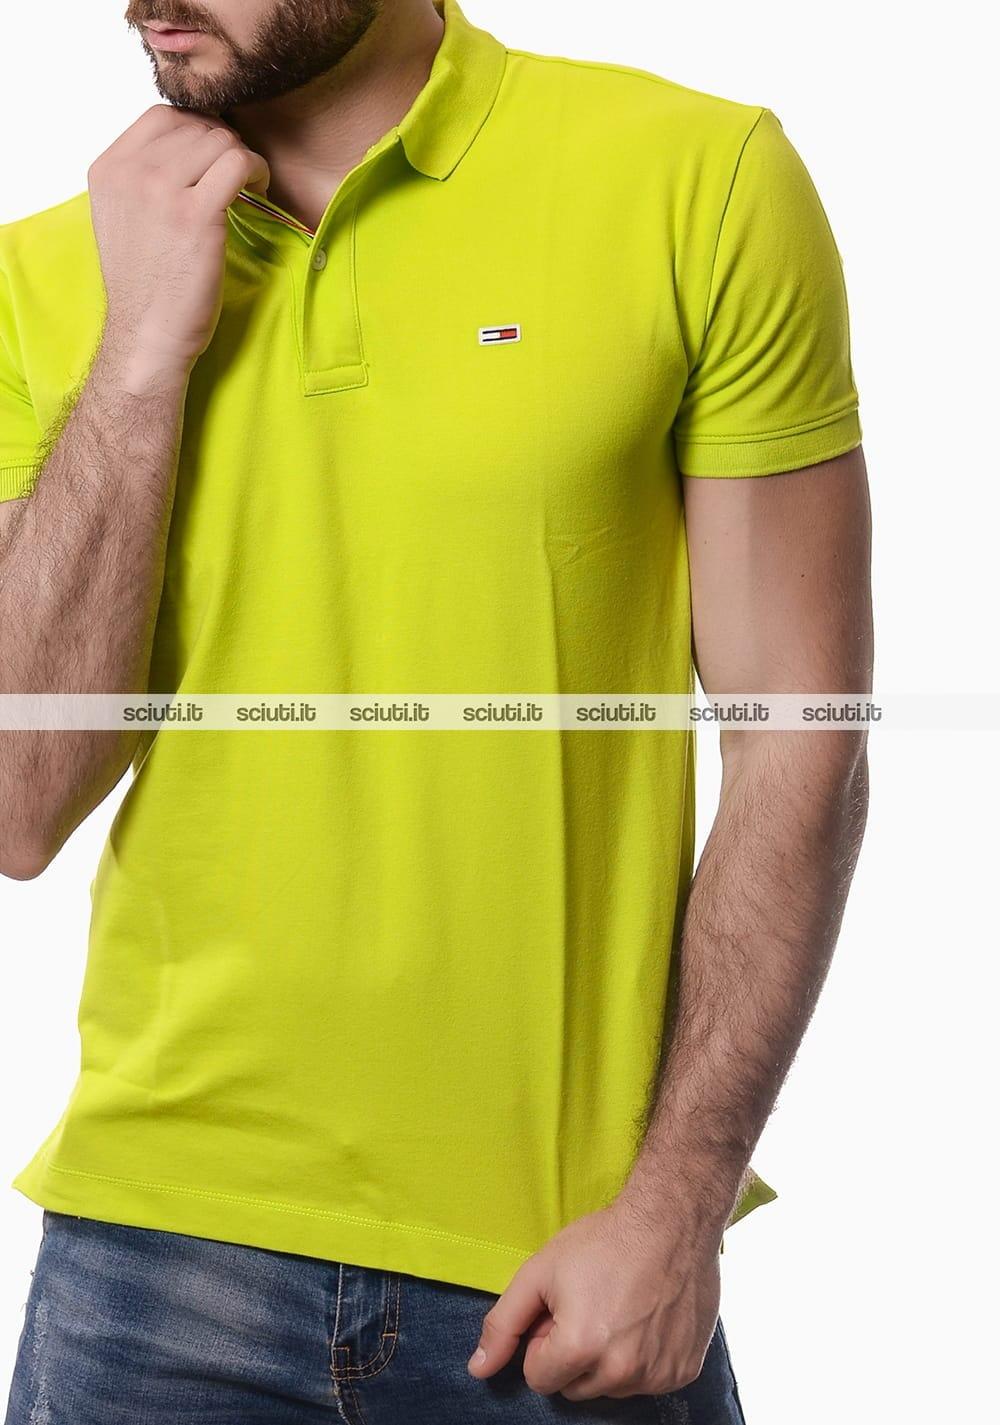 Polo Tommy Hilfiger uomo classic verde lime | Sciuti.it